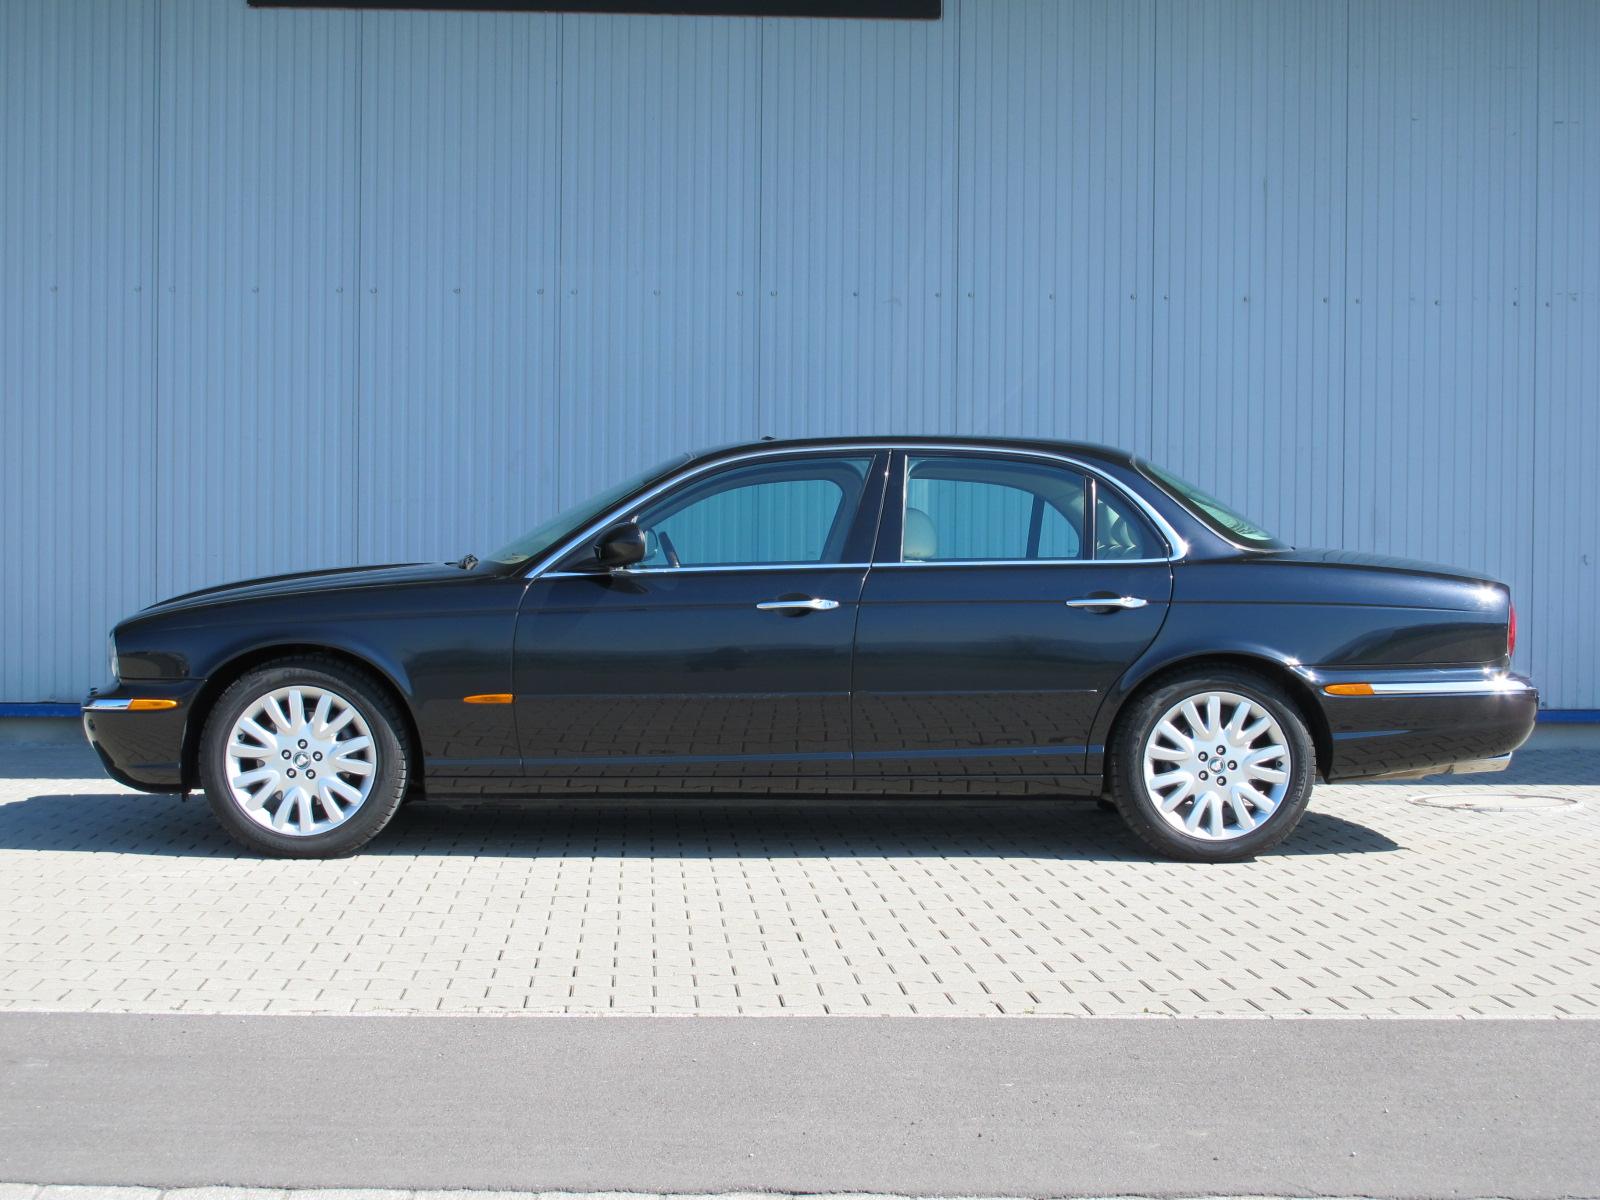 Jaguar XJ8 4.2 Liter schwarz 2003